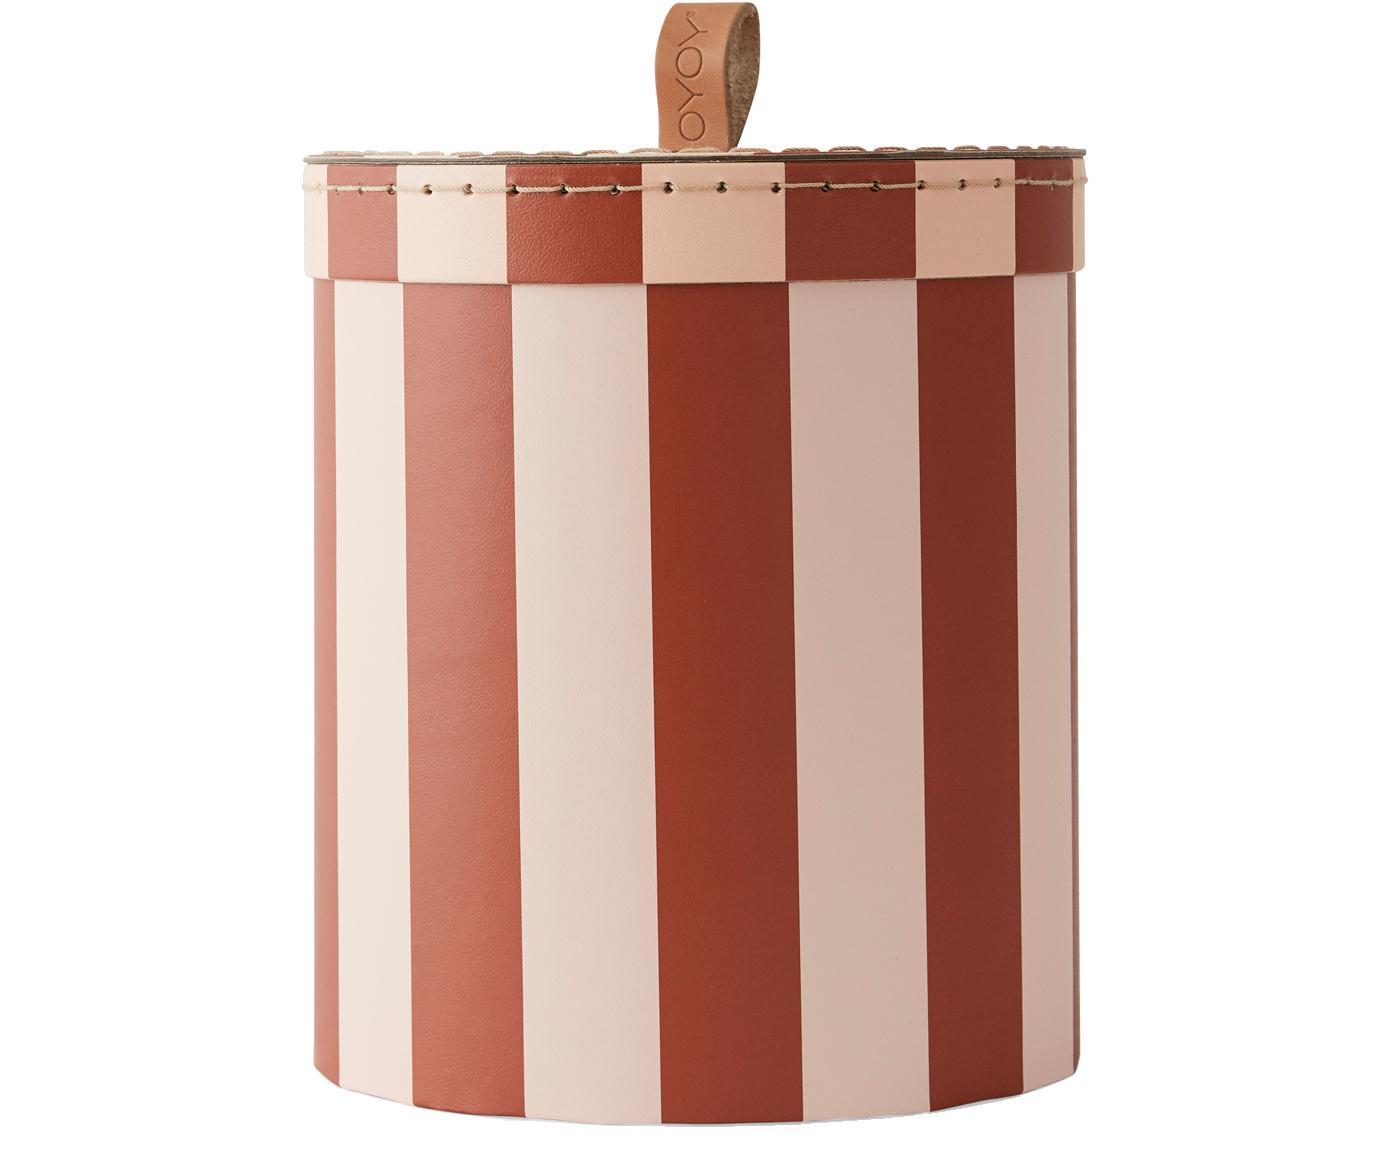 Opbergdoos Cecila, Karton, leer, Rood, crèmekleurig, Ø 17 x H 20 cm